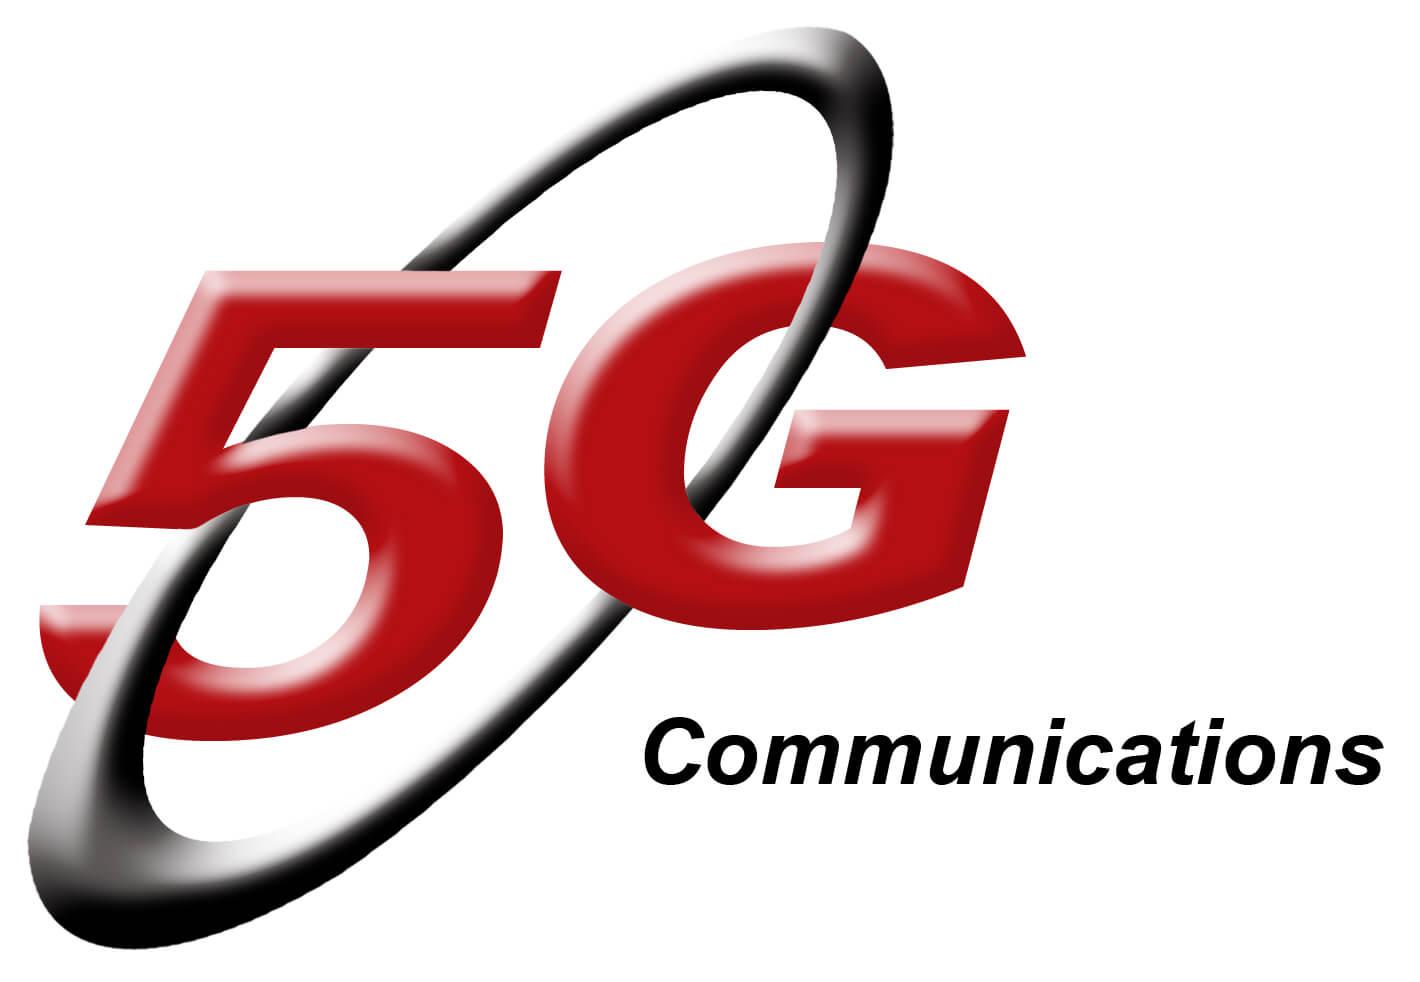 Сети 5G в Корее